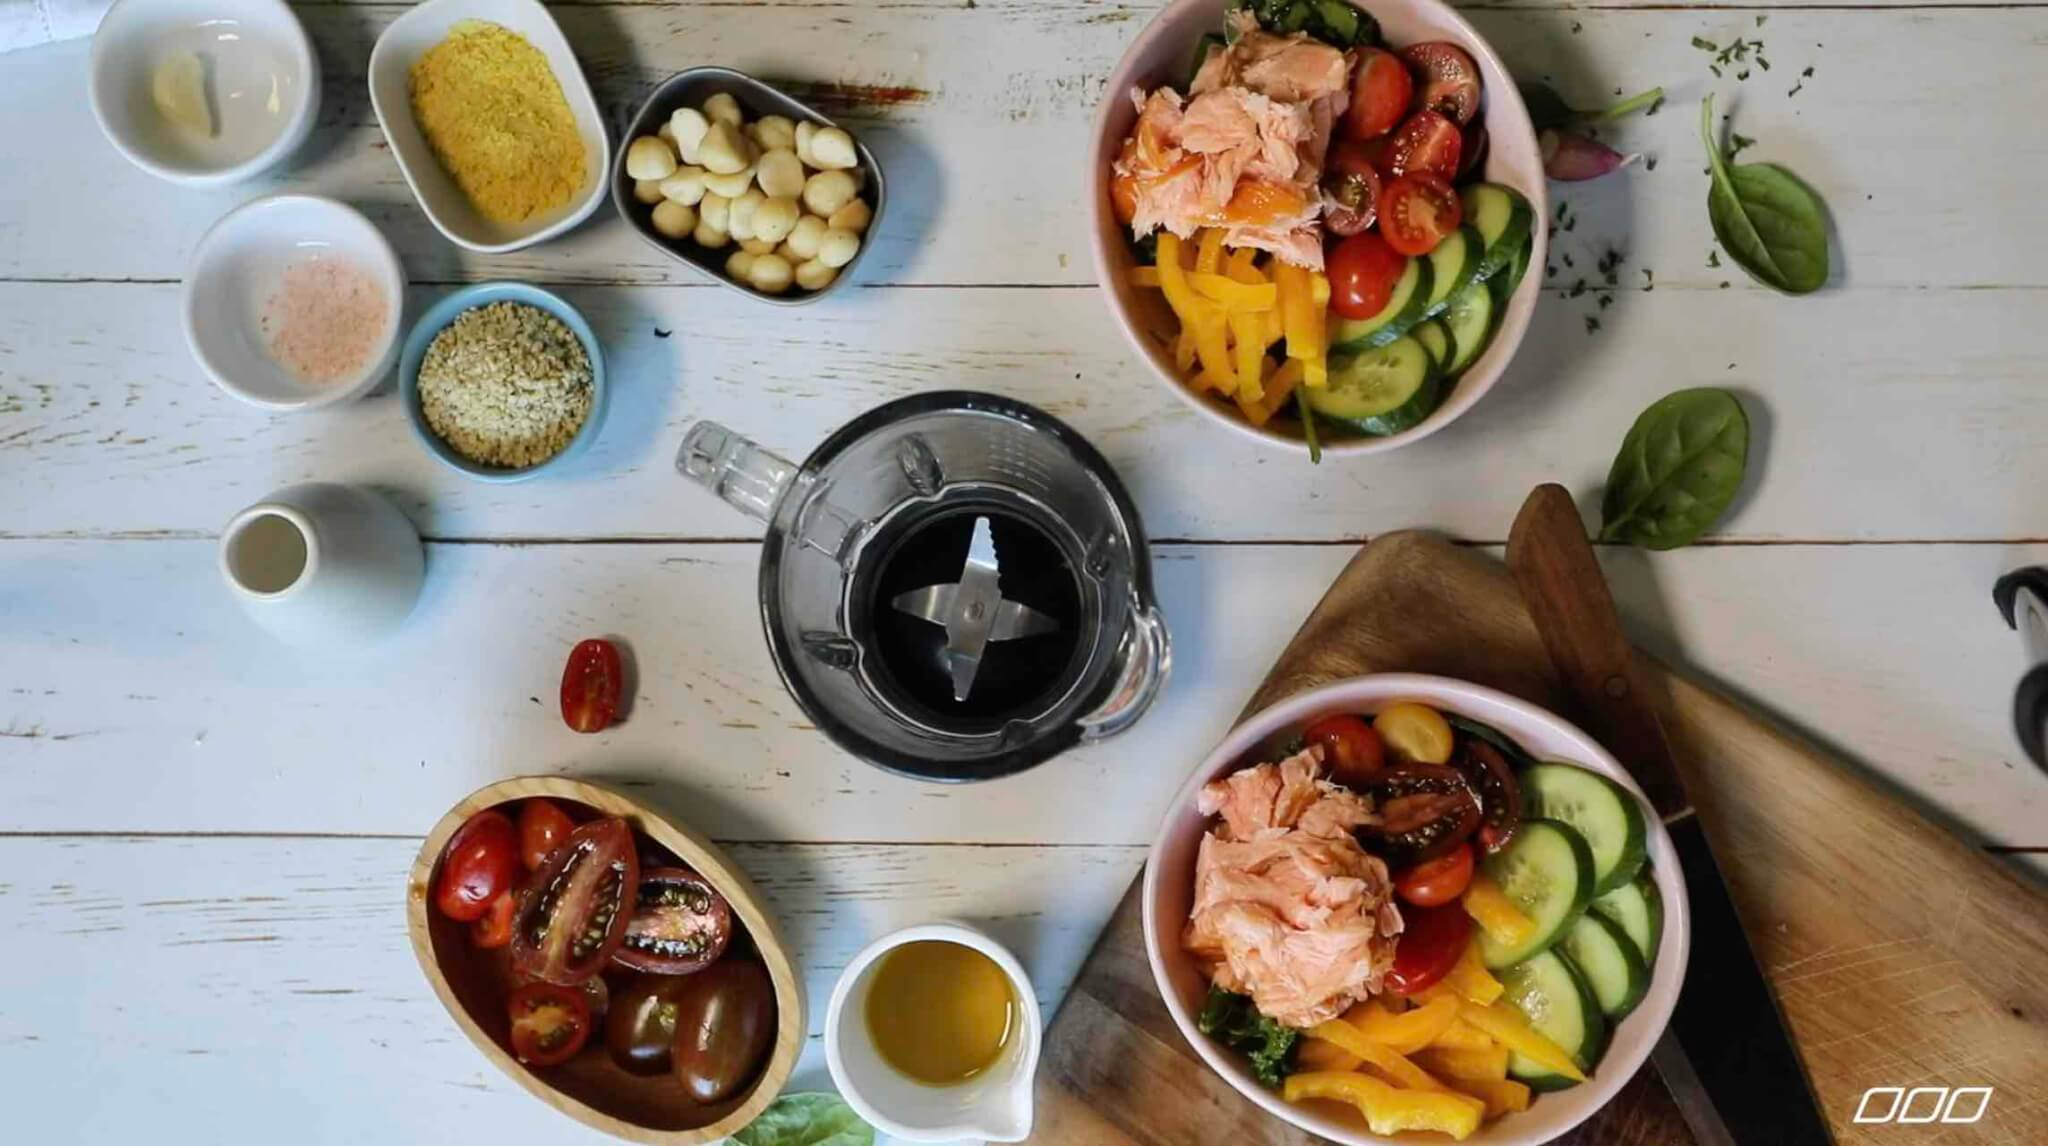 10 Minute Hot Smoked Salmon & Greens Bowl